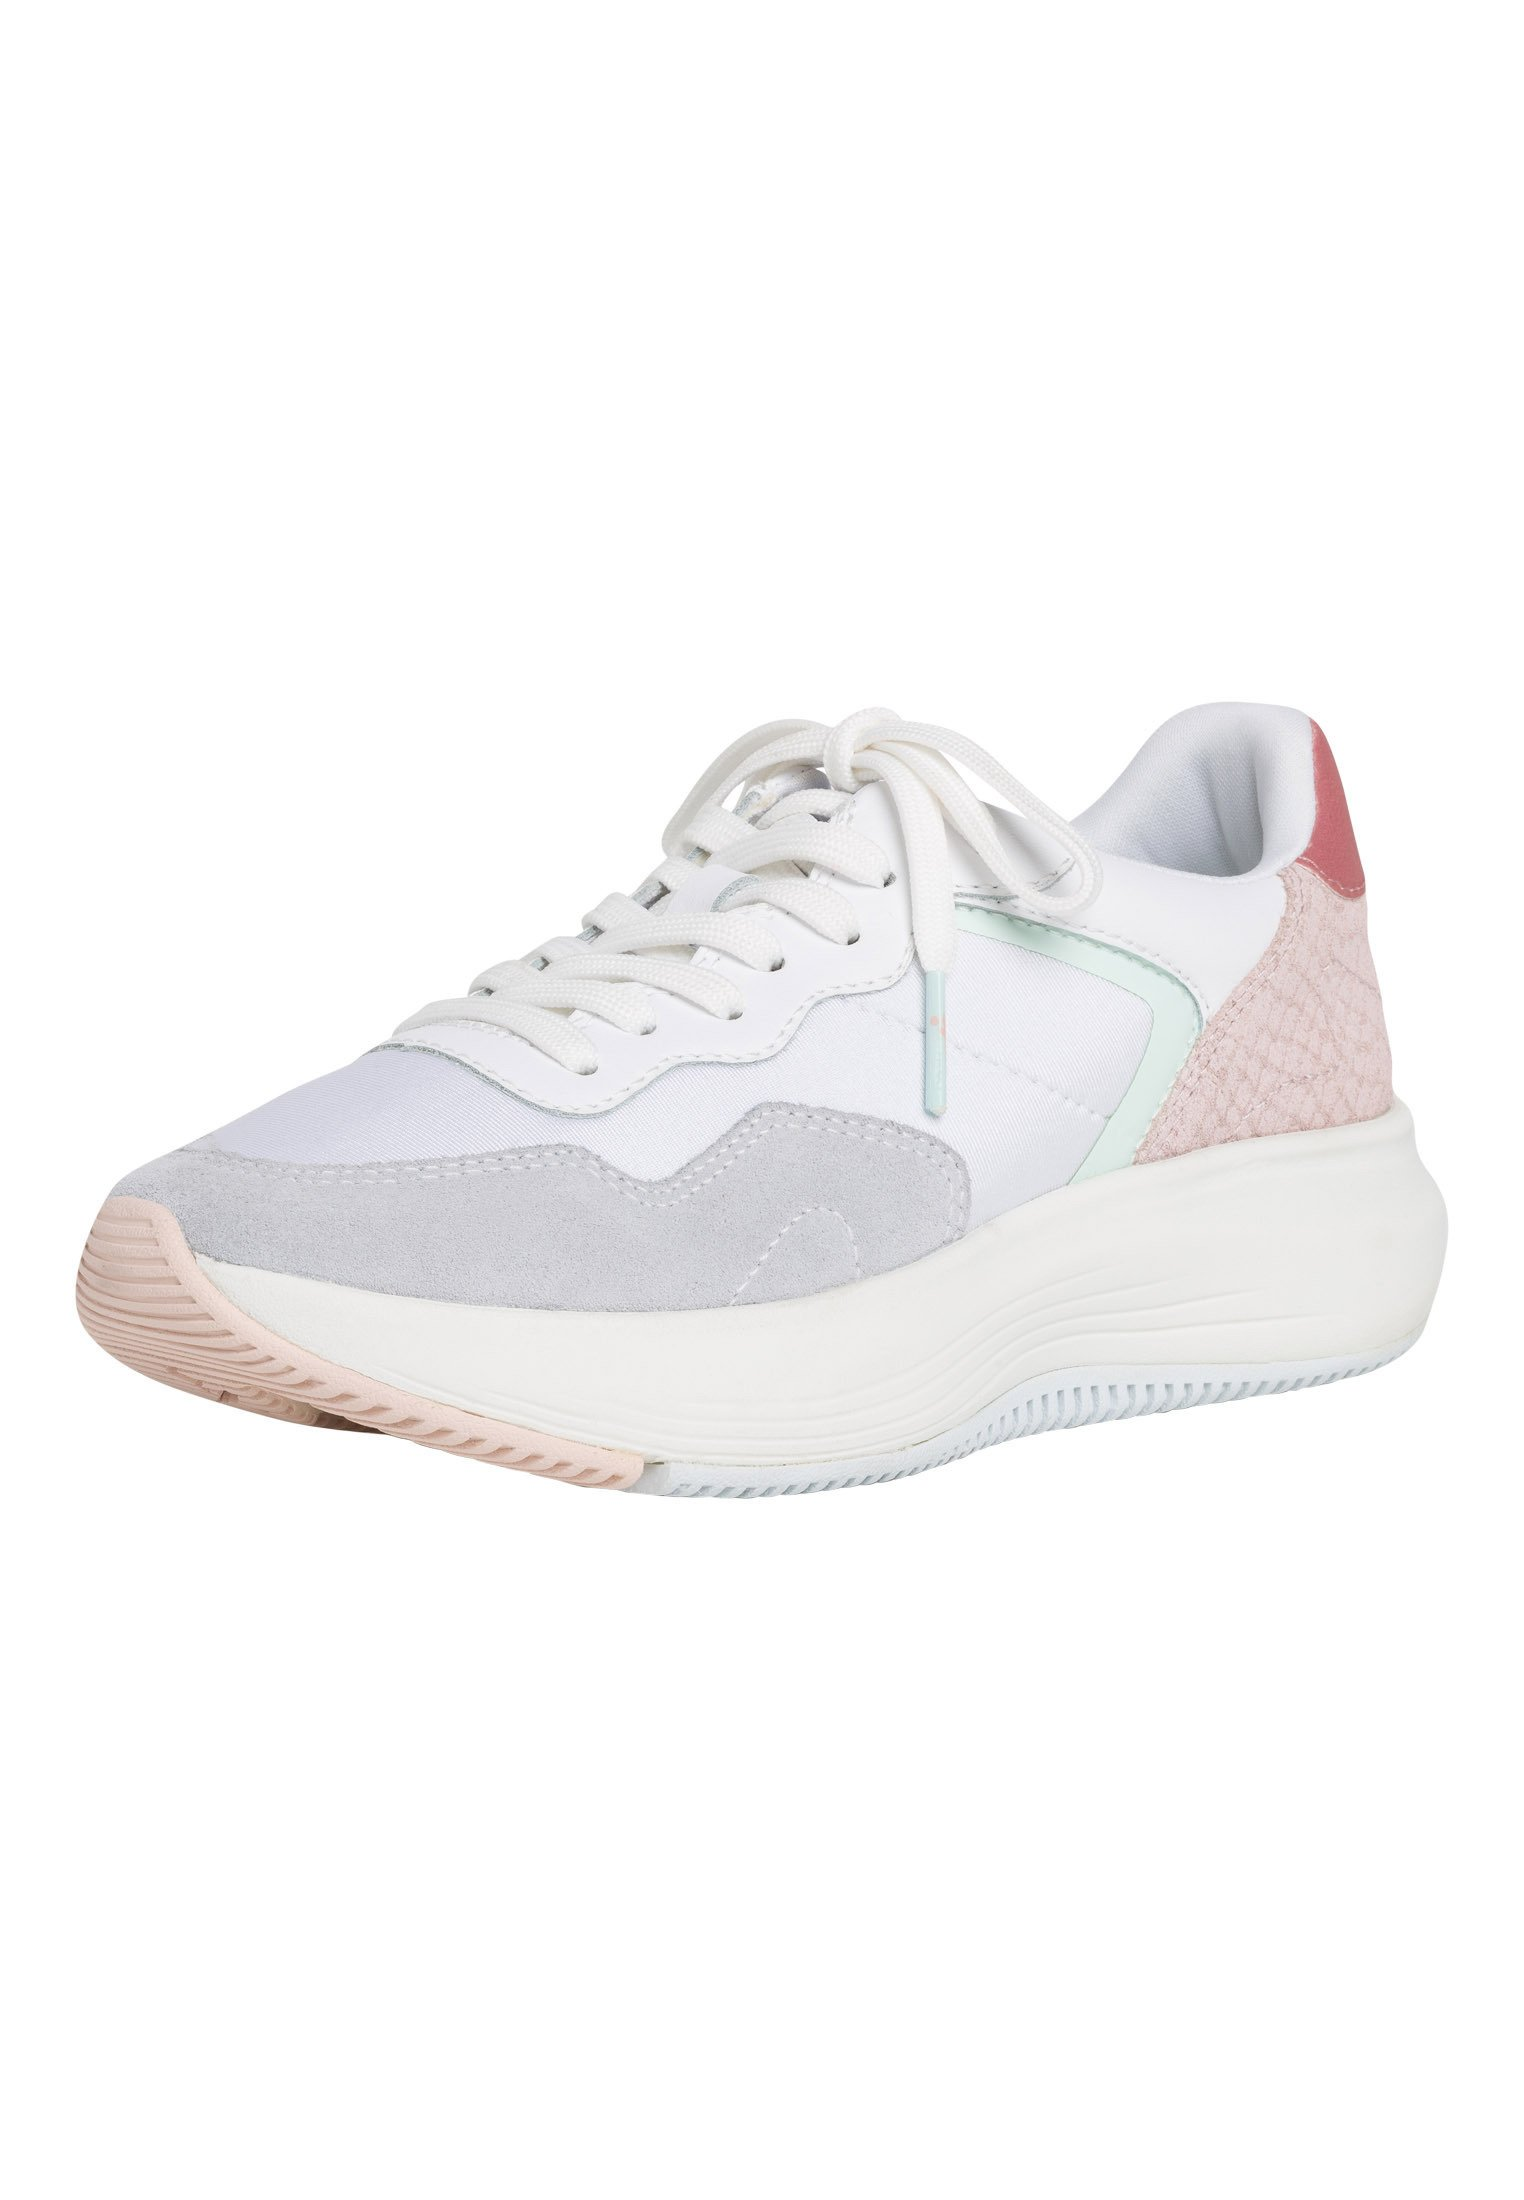 Tamaris SNEAKER - Baskets basses - grey - Sneakers femme Dernier